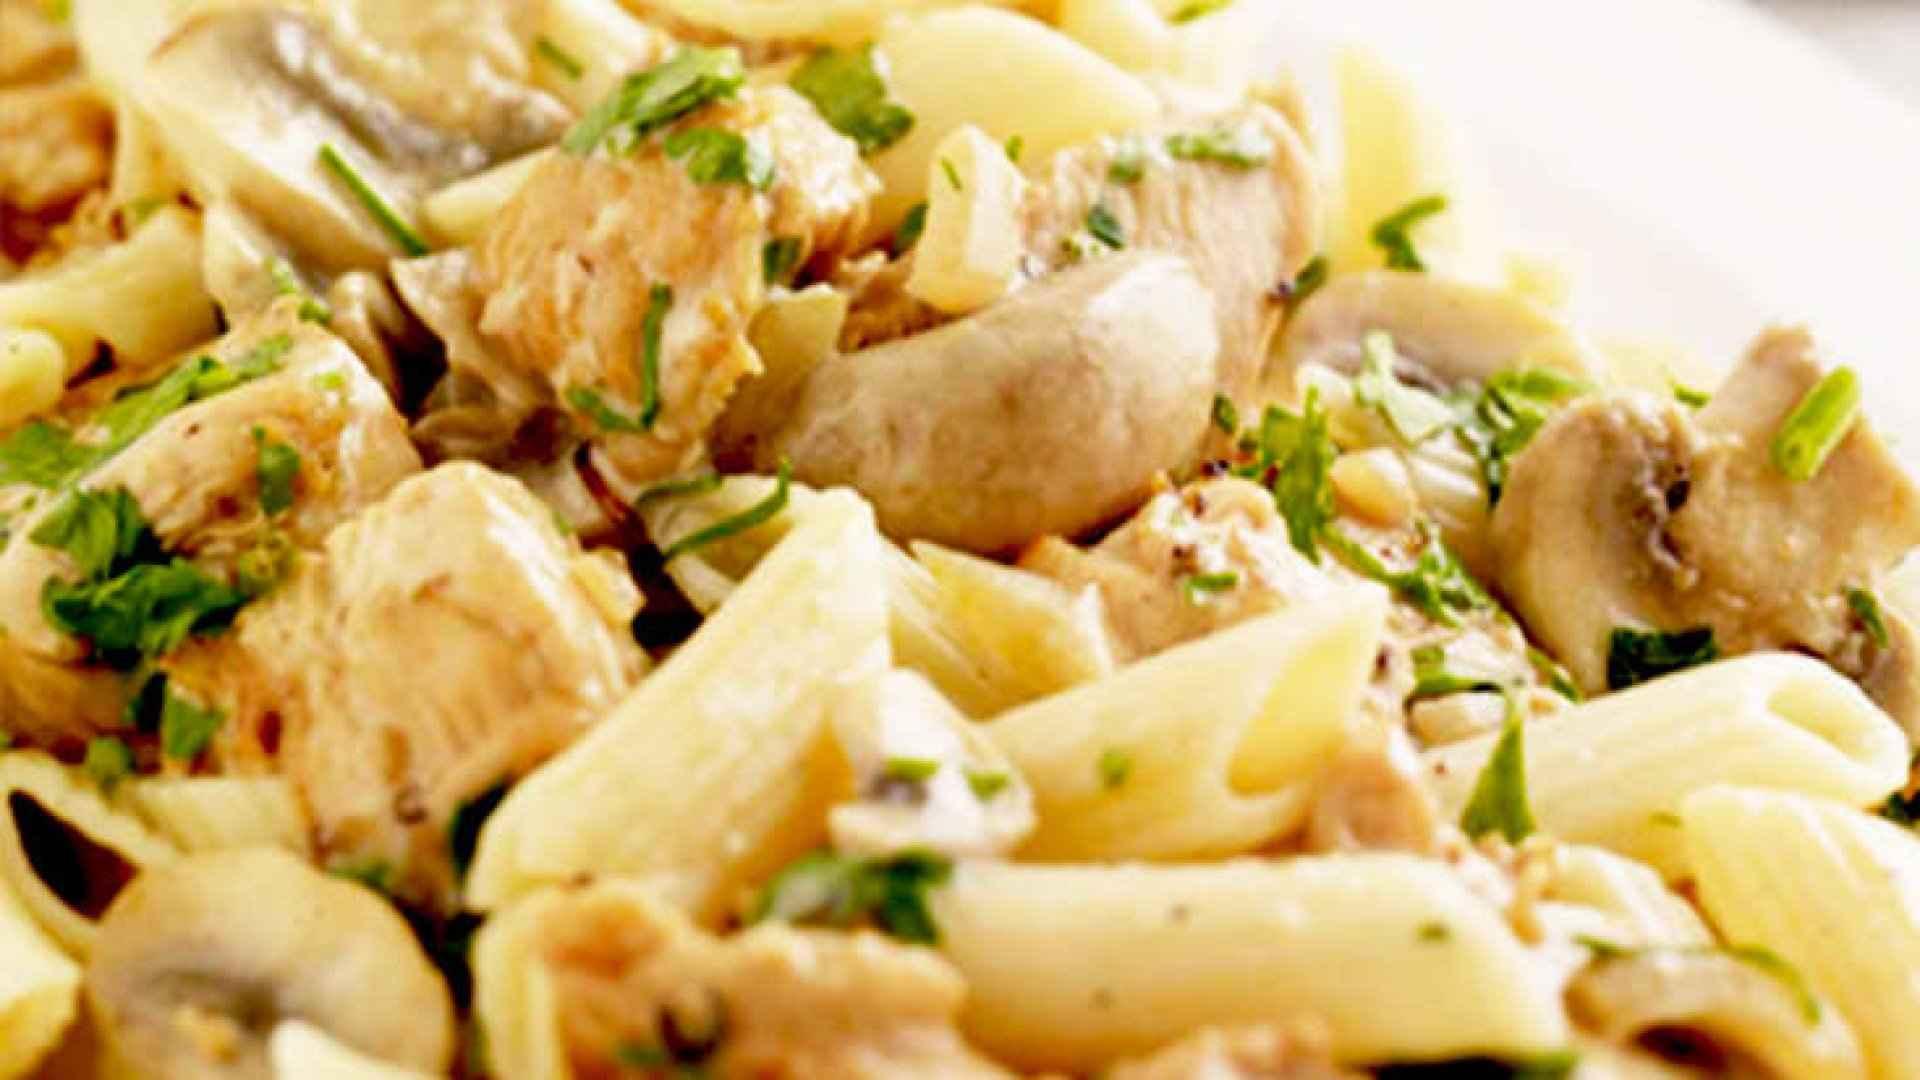 Creamy chicken pasta with mushrooms